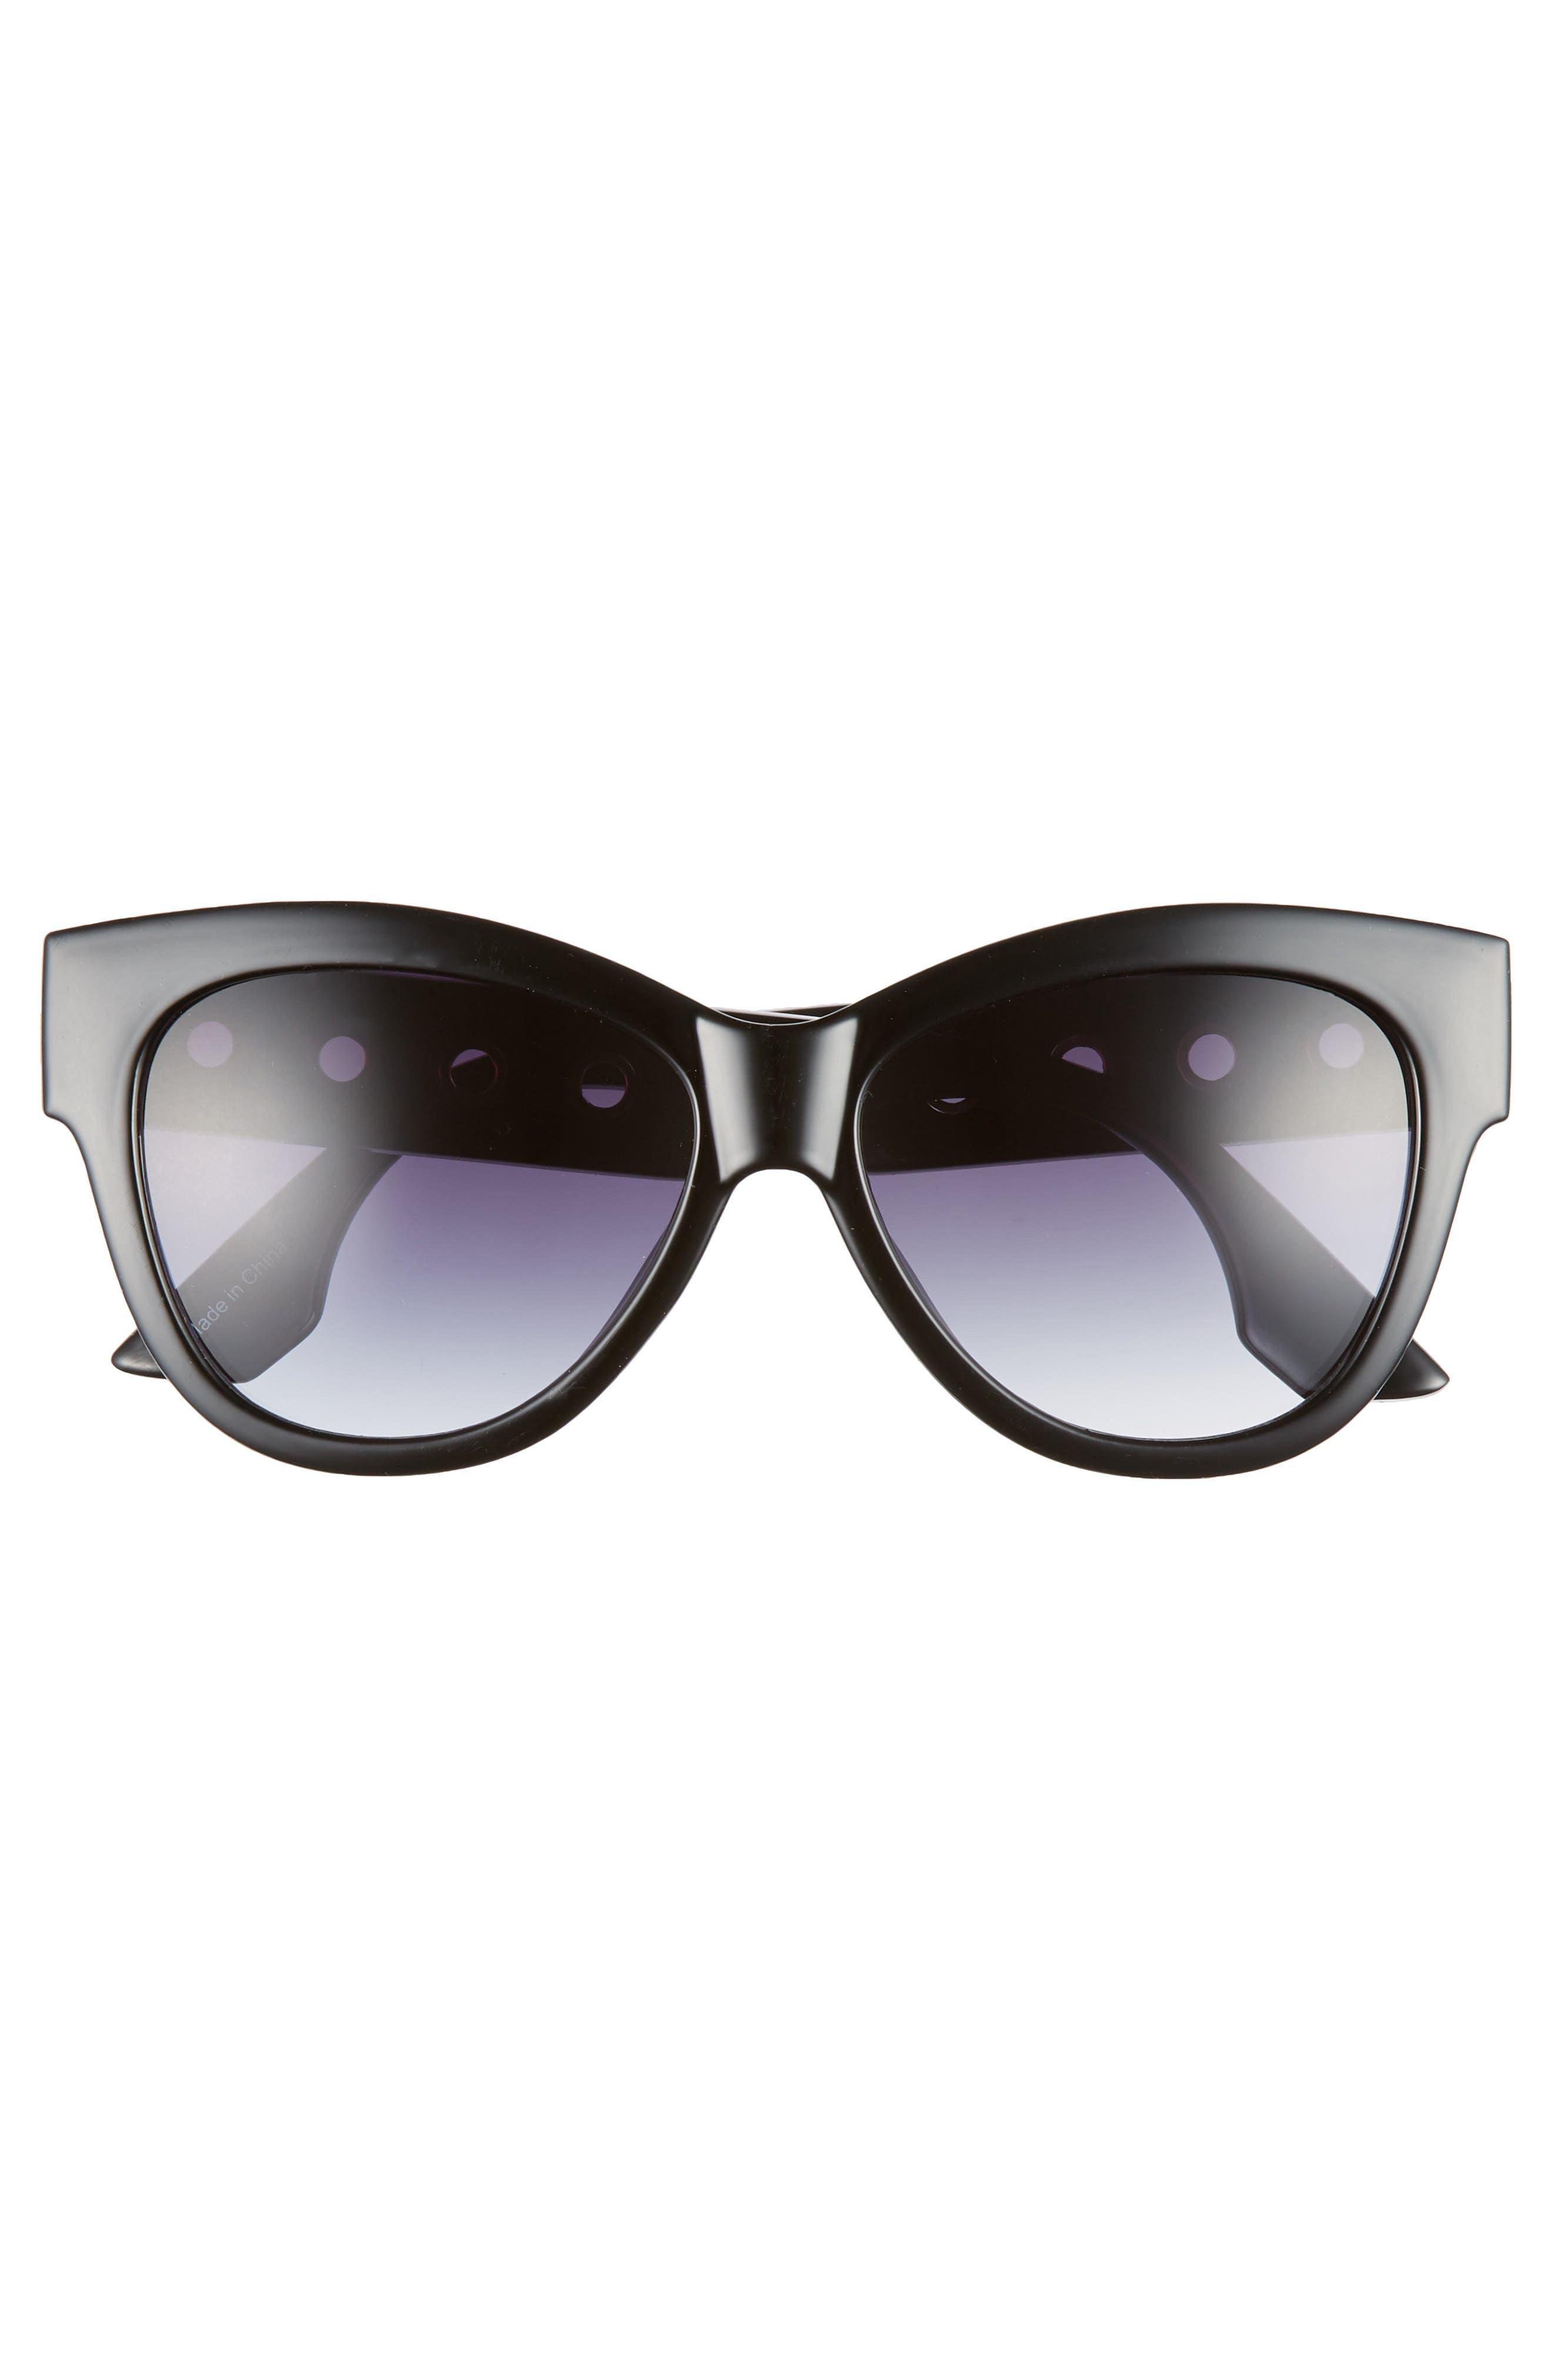 61mm Grommet Detail Square Sunglasses,                             Alternate thumbnail 3, color,                             BLACK/ SILVER